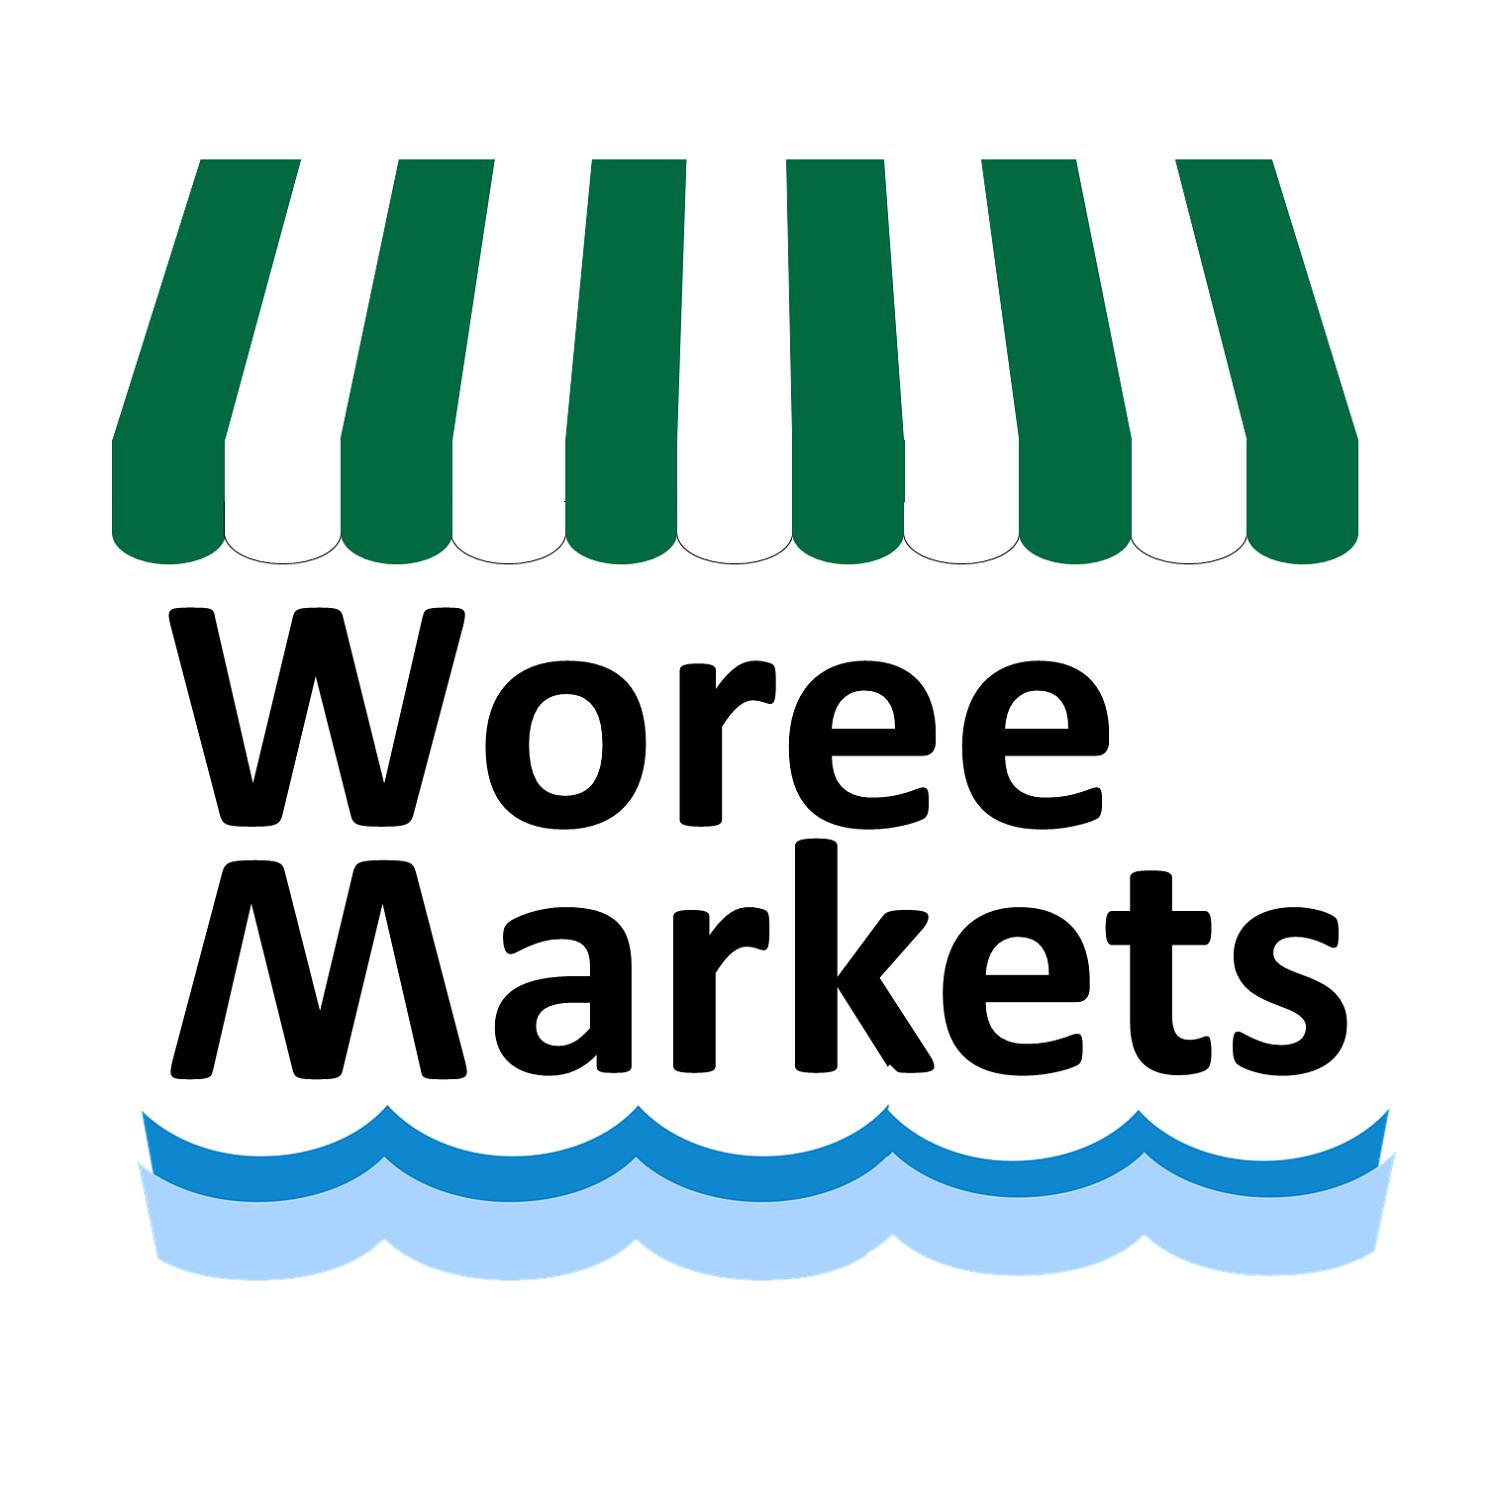 Woree Markets image